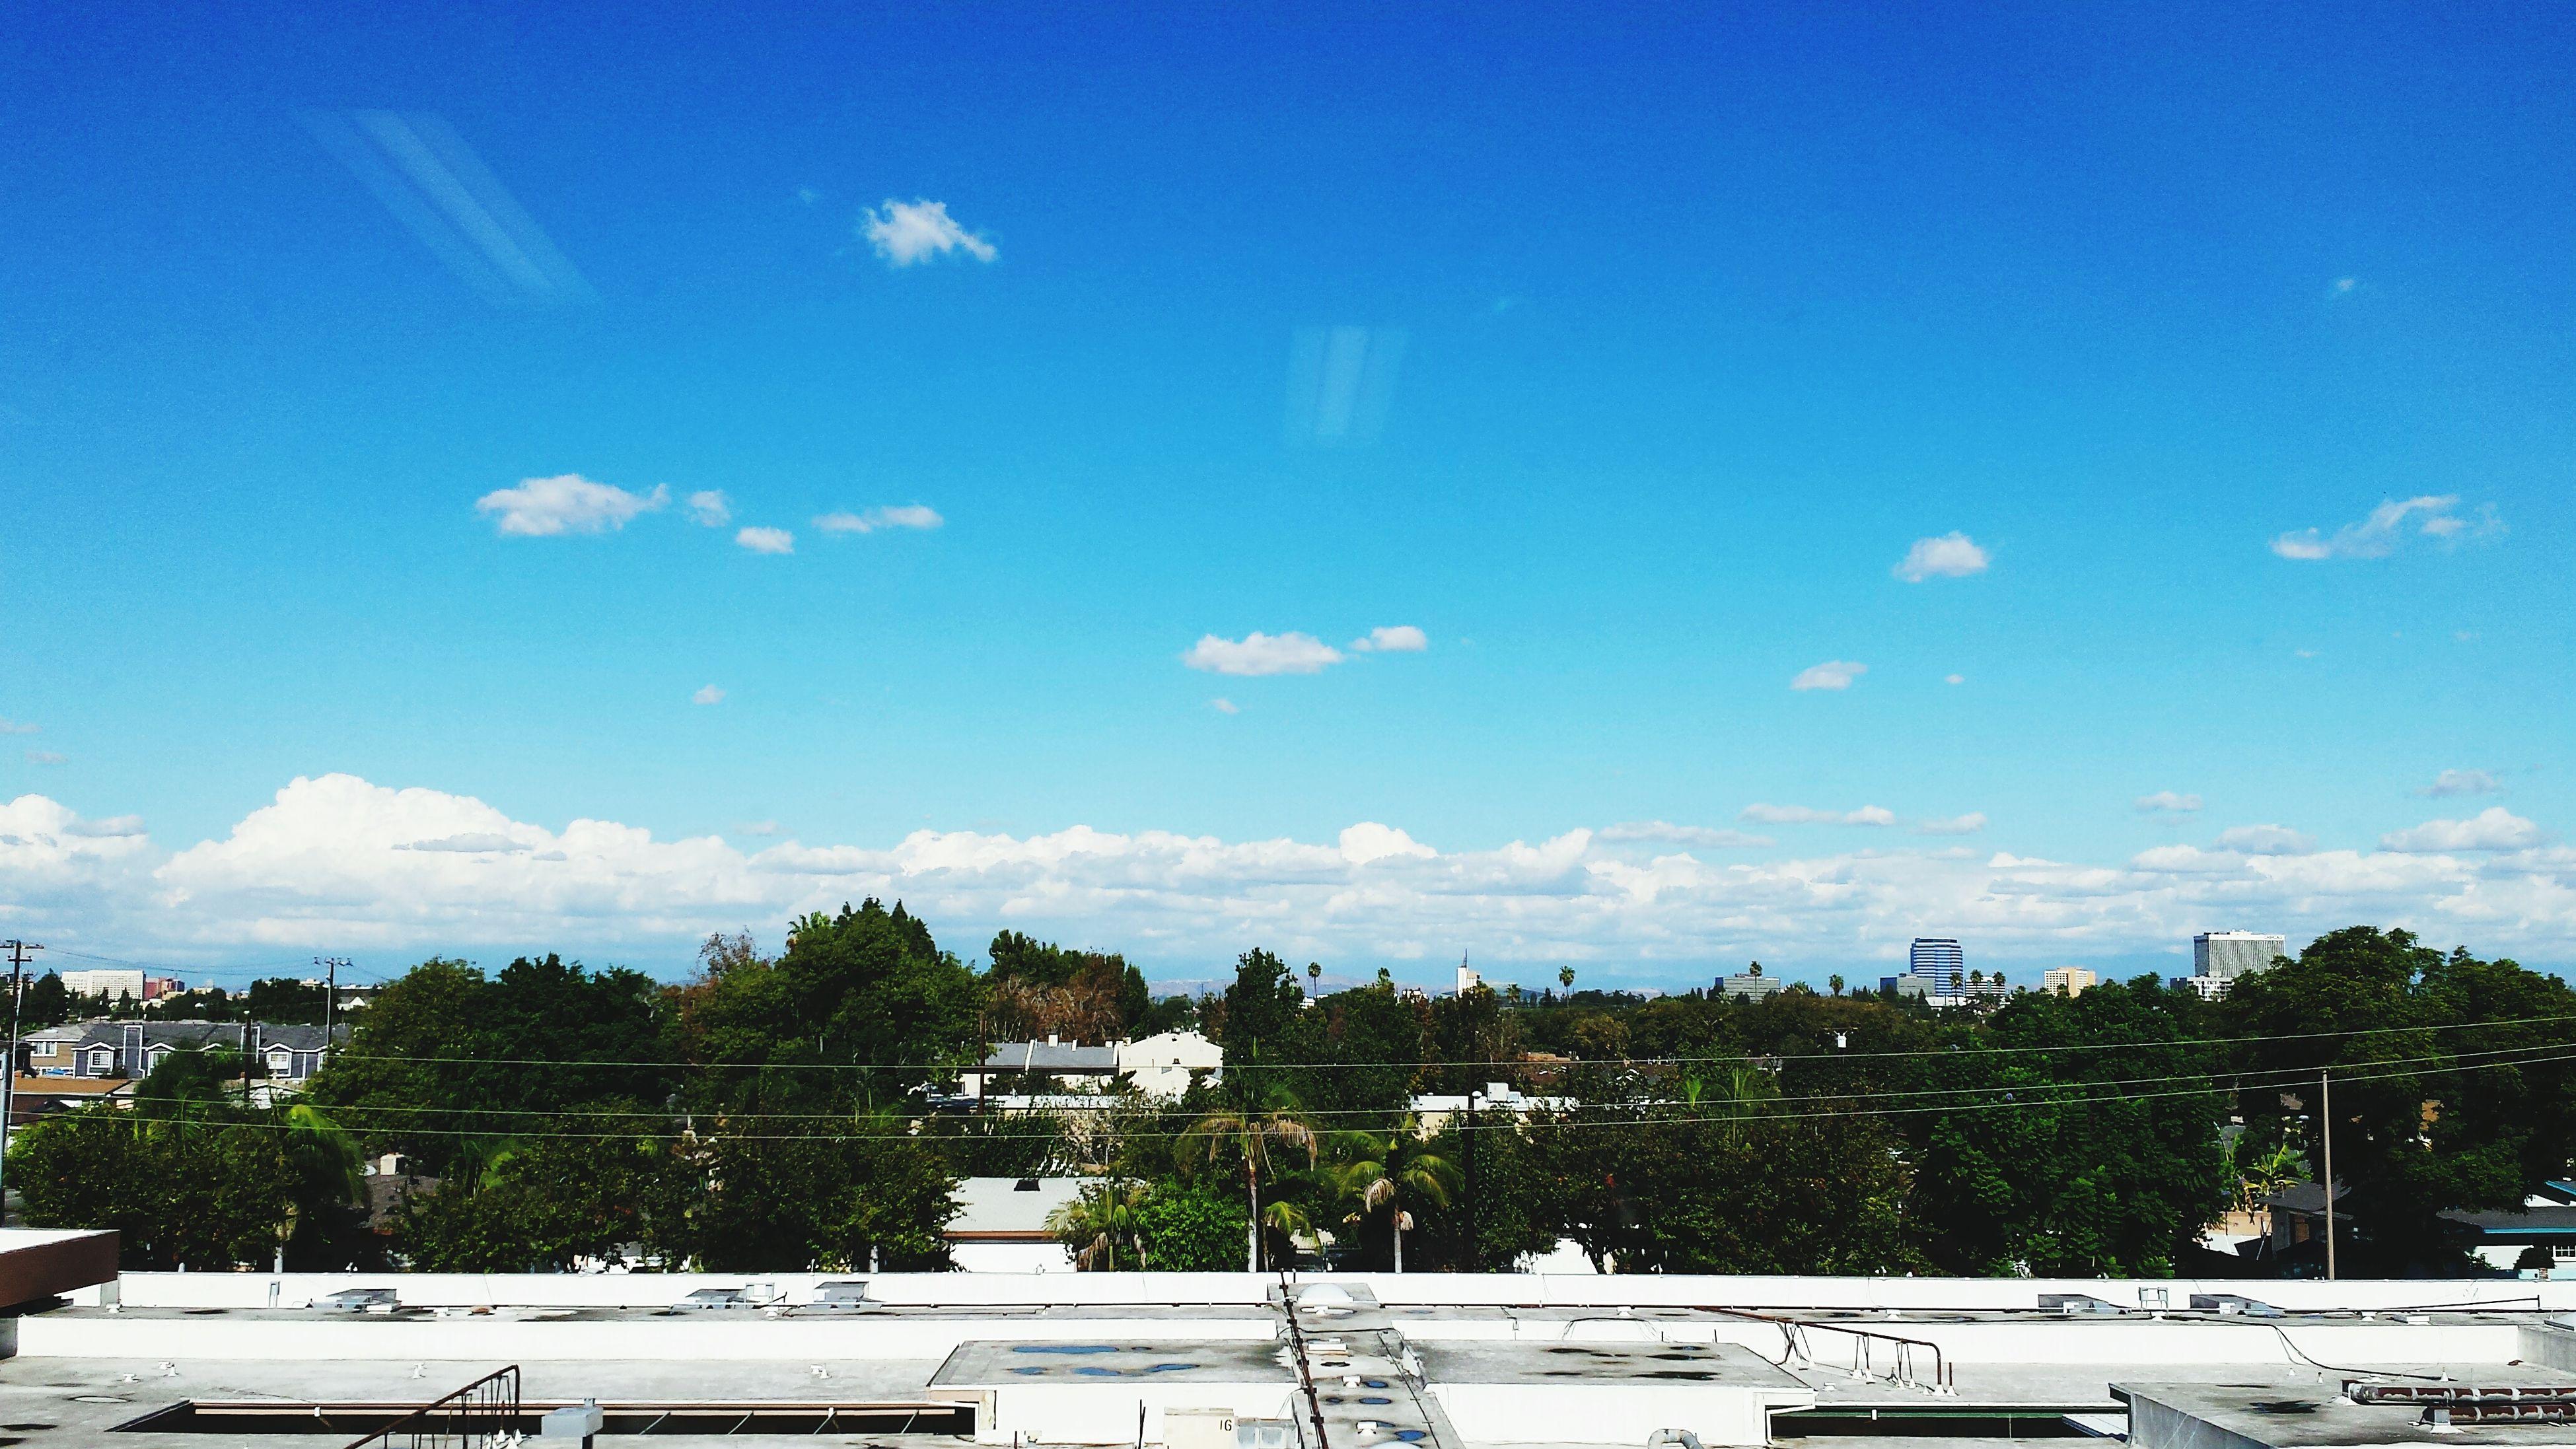 building exterior, tree, architecture, built structure, sky, blue, city, cloud, cloud - sky, day, residential building, sunlight, cityscape, residential structure, outdoors, house, growth, building, residential district, nature